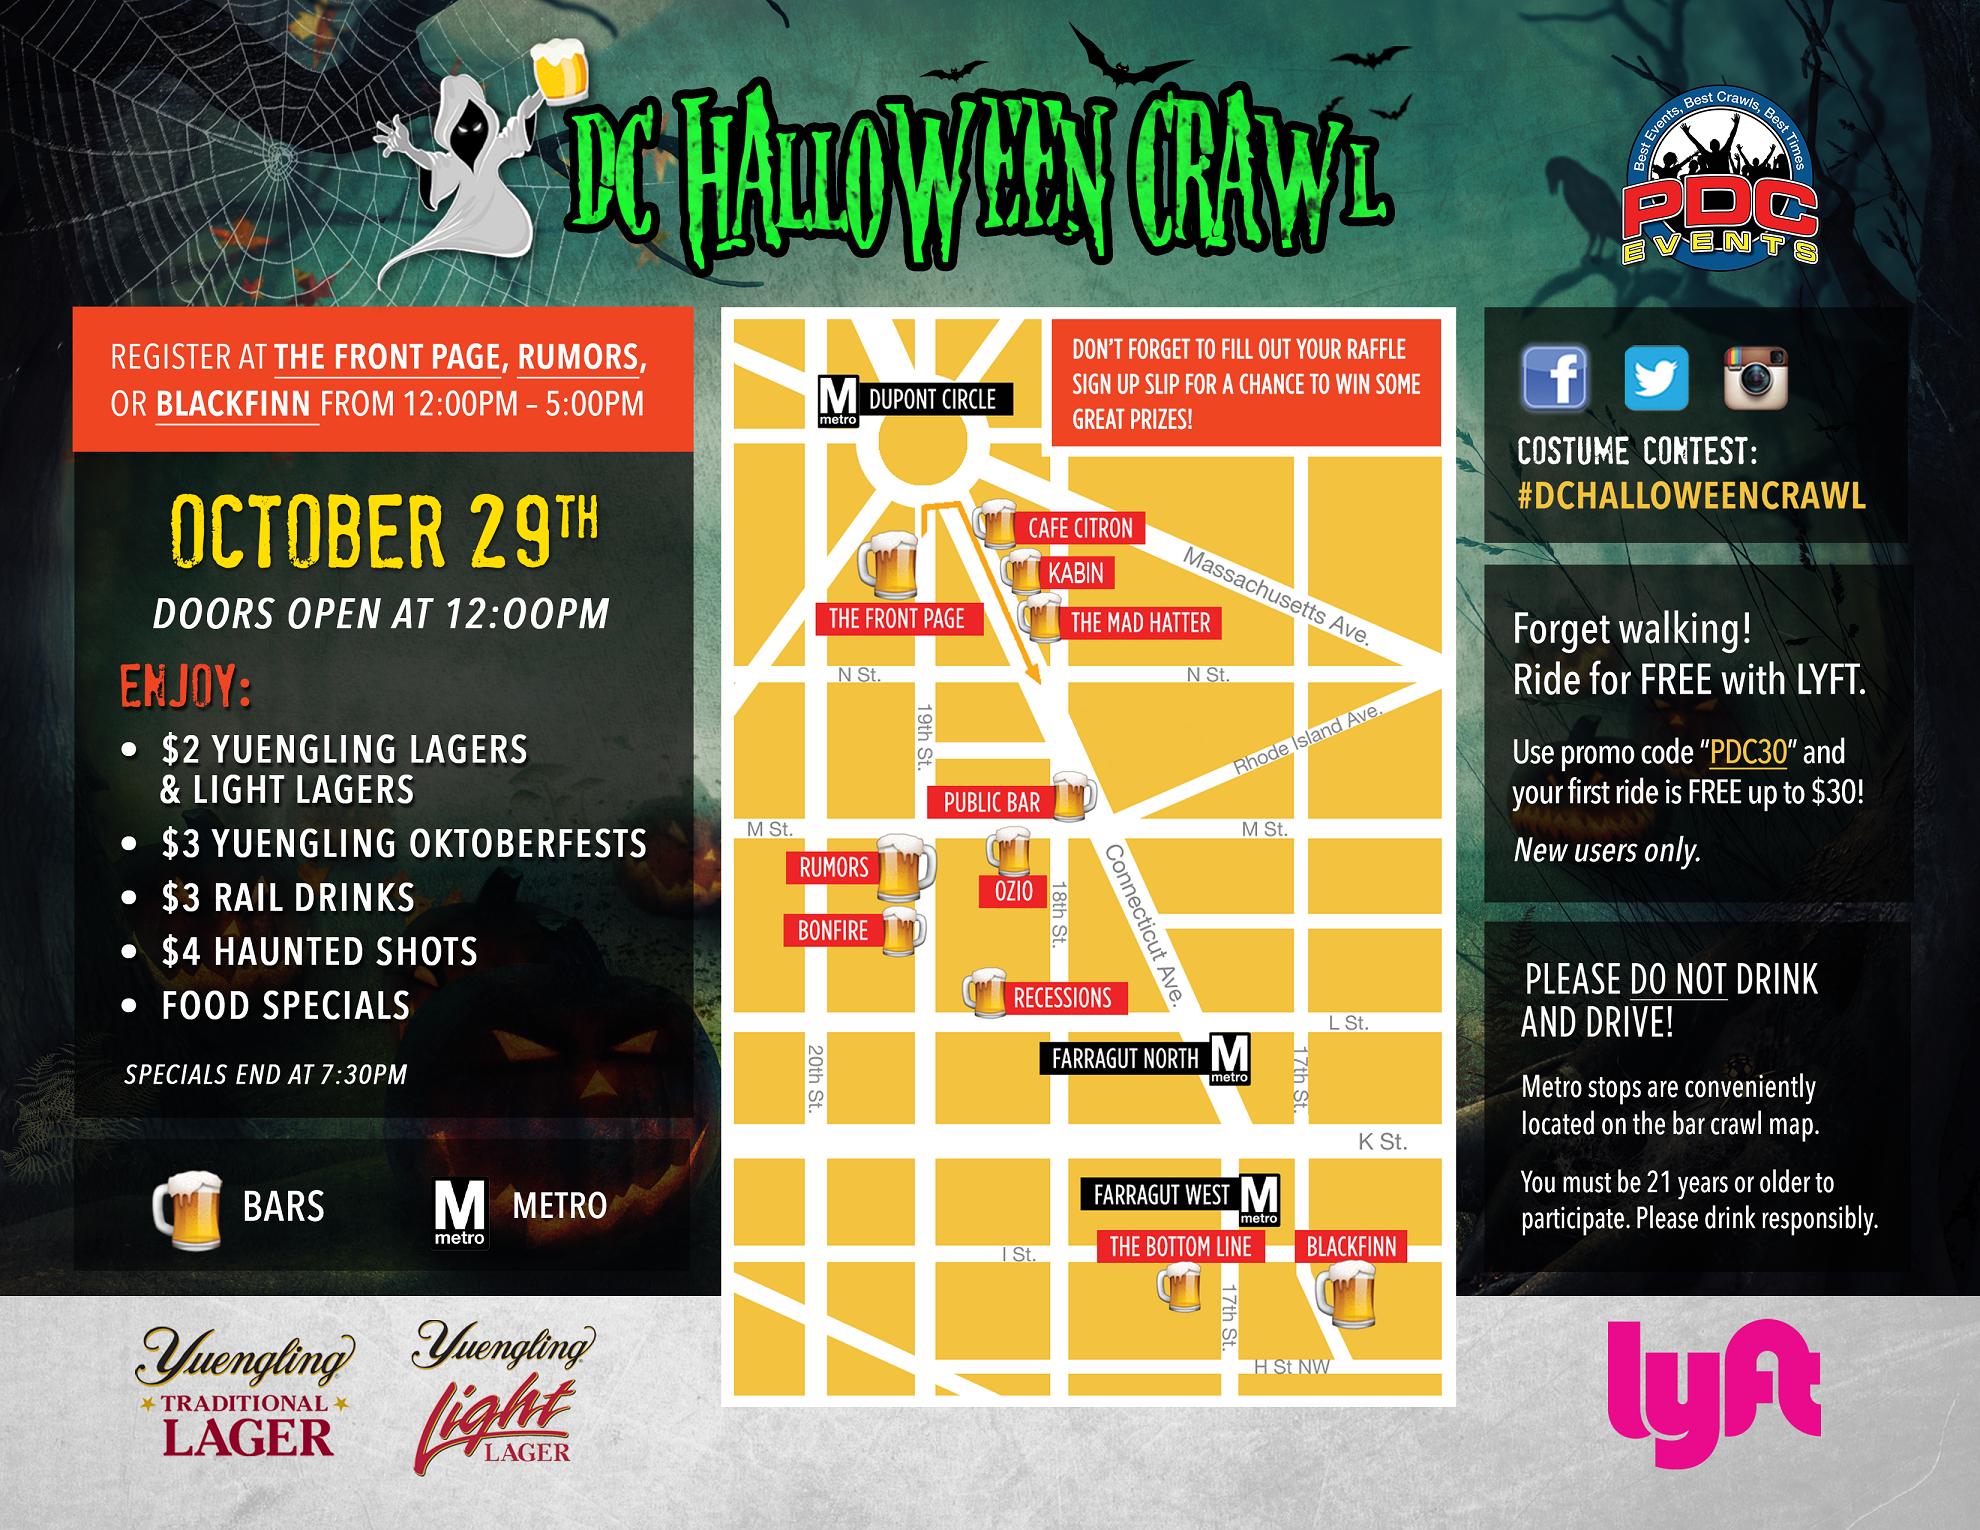 DC Halloween Crawl 2016